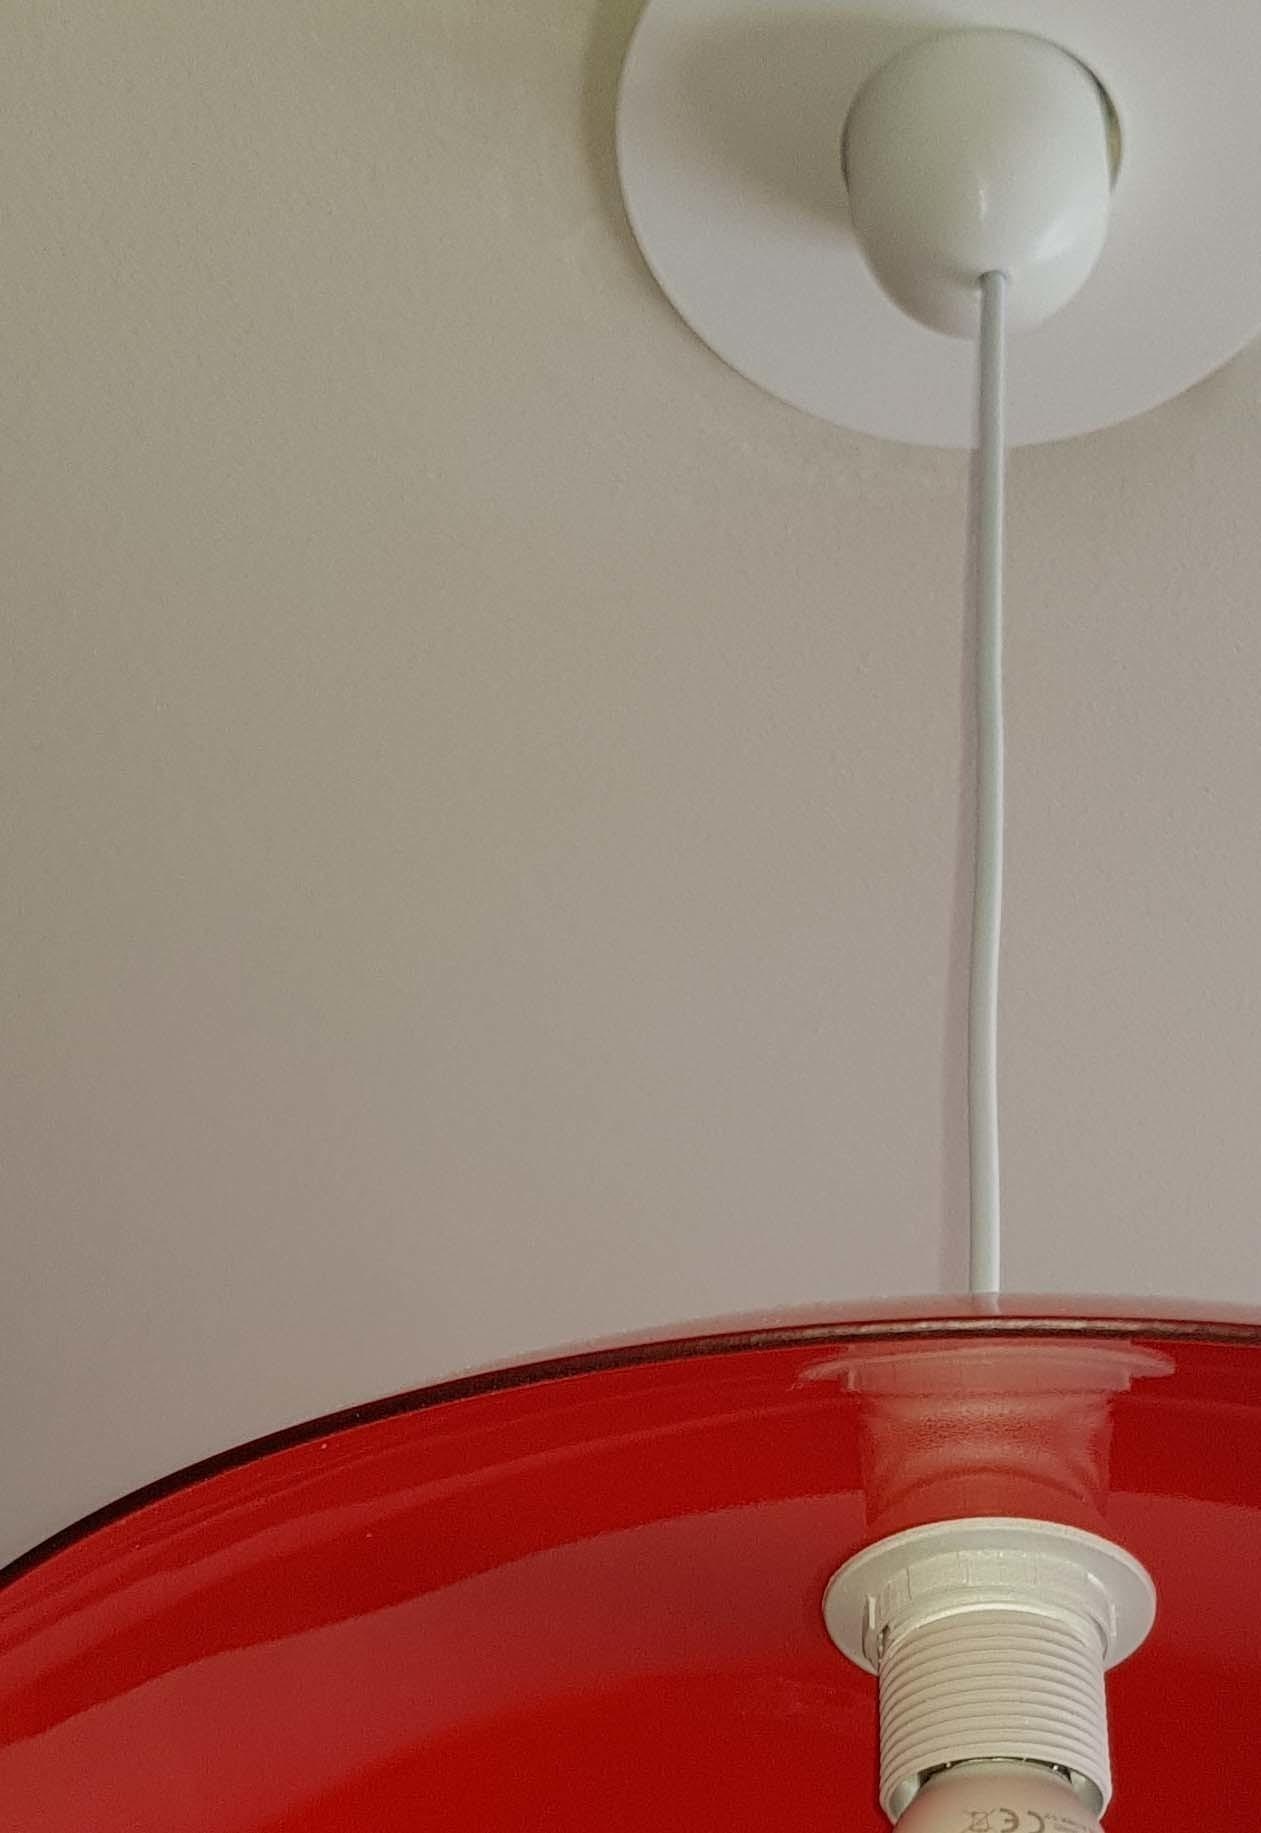 20180504_125133 (1).jpg Download STL file Ceiling light • 3D printing design, n256